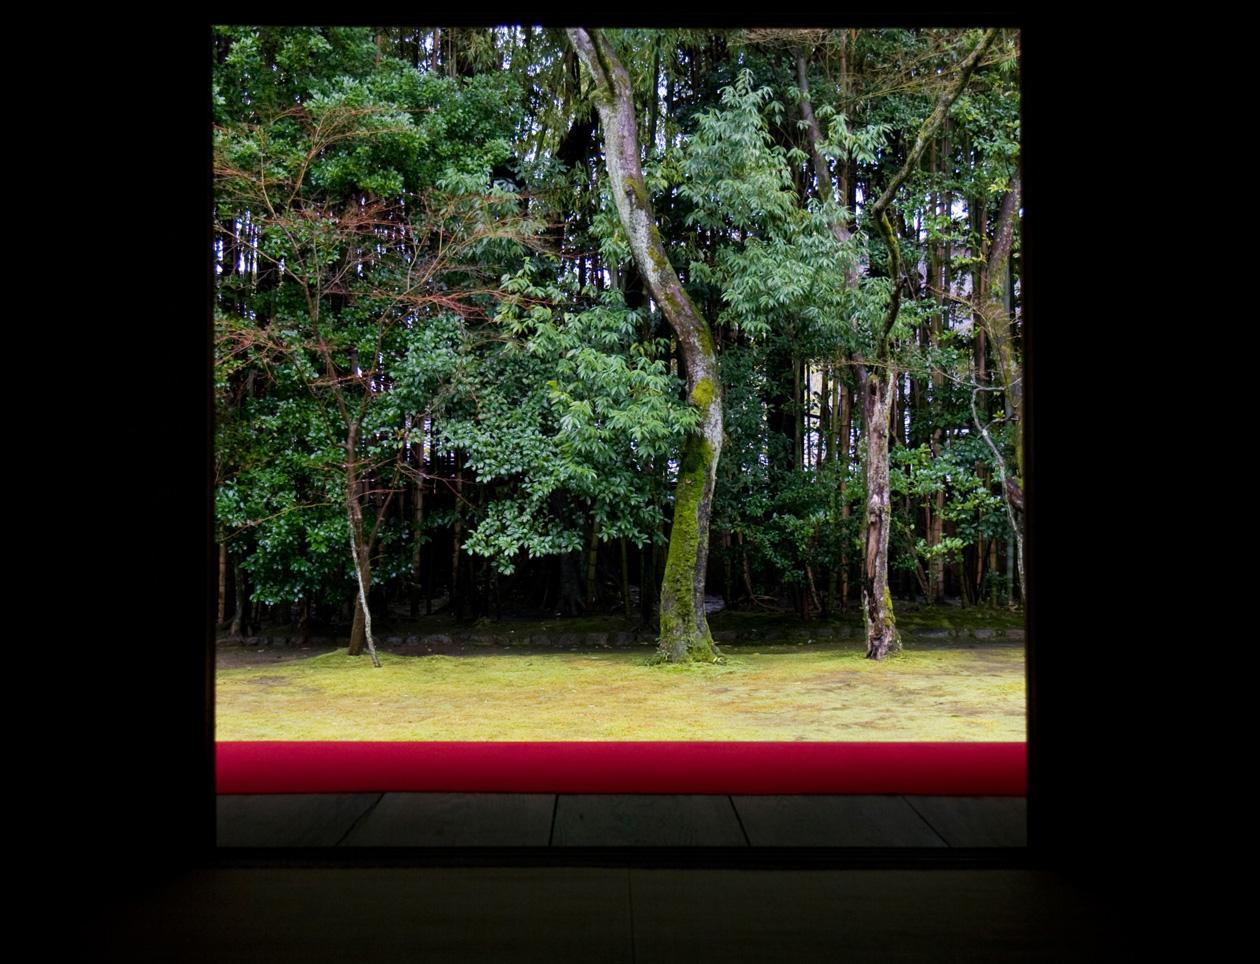 冬の京都 大徳寺 高桐院 楓と苔 _e0127948_1524185.jpg